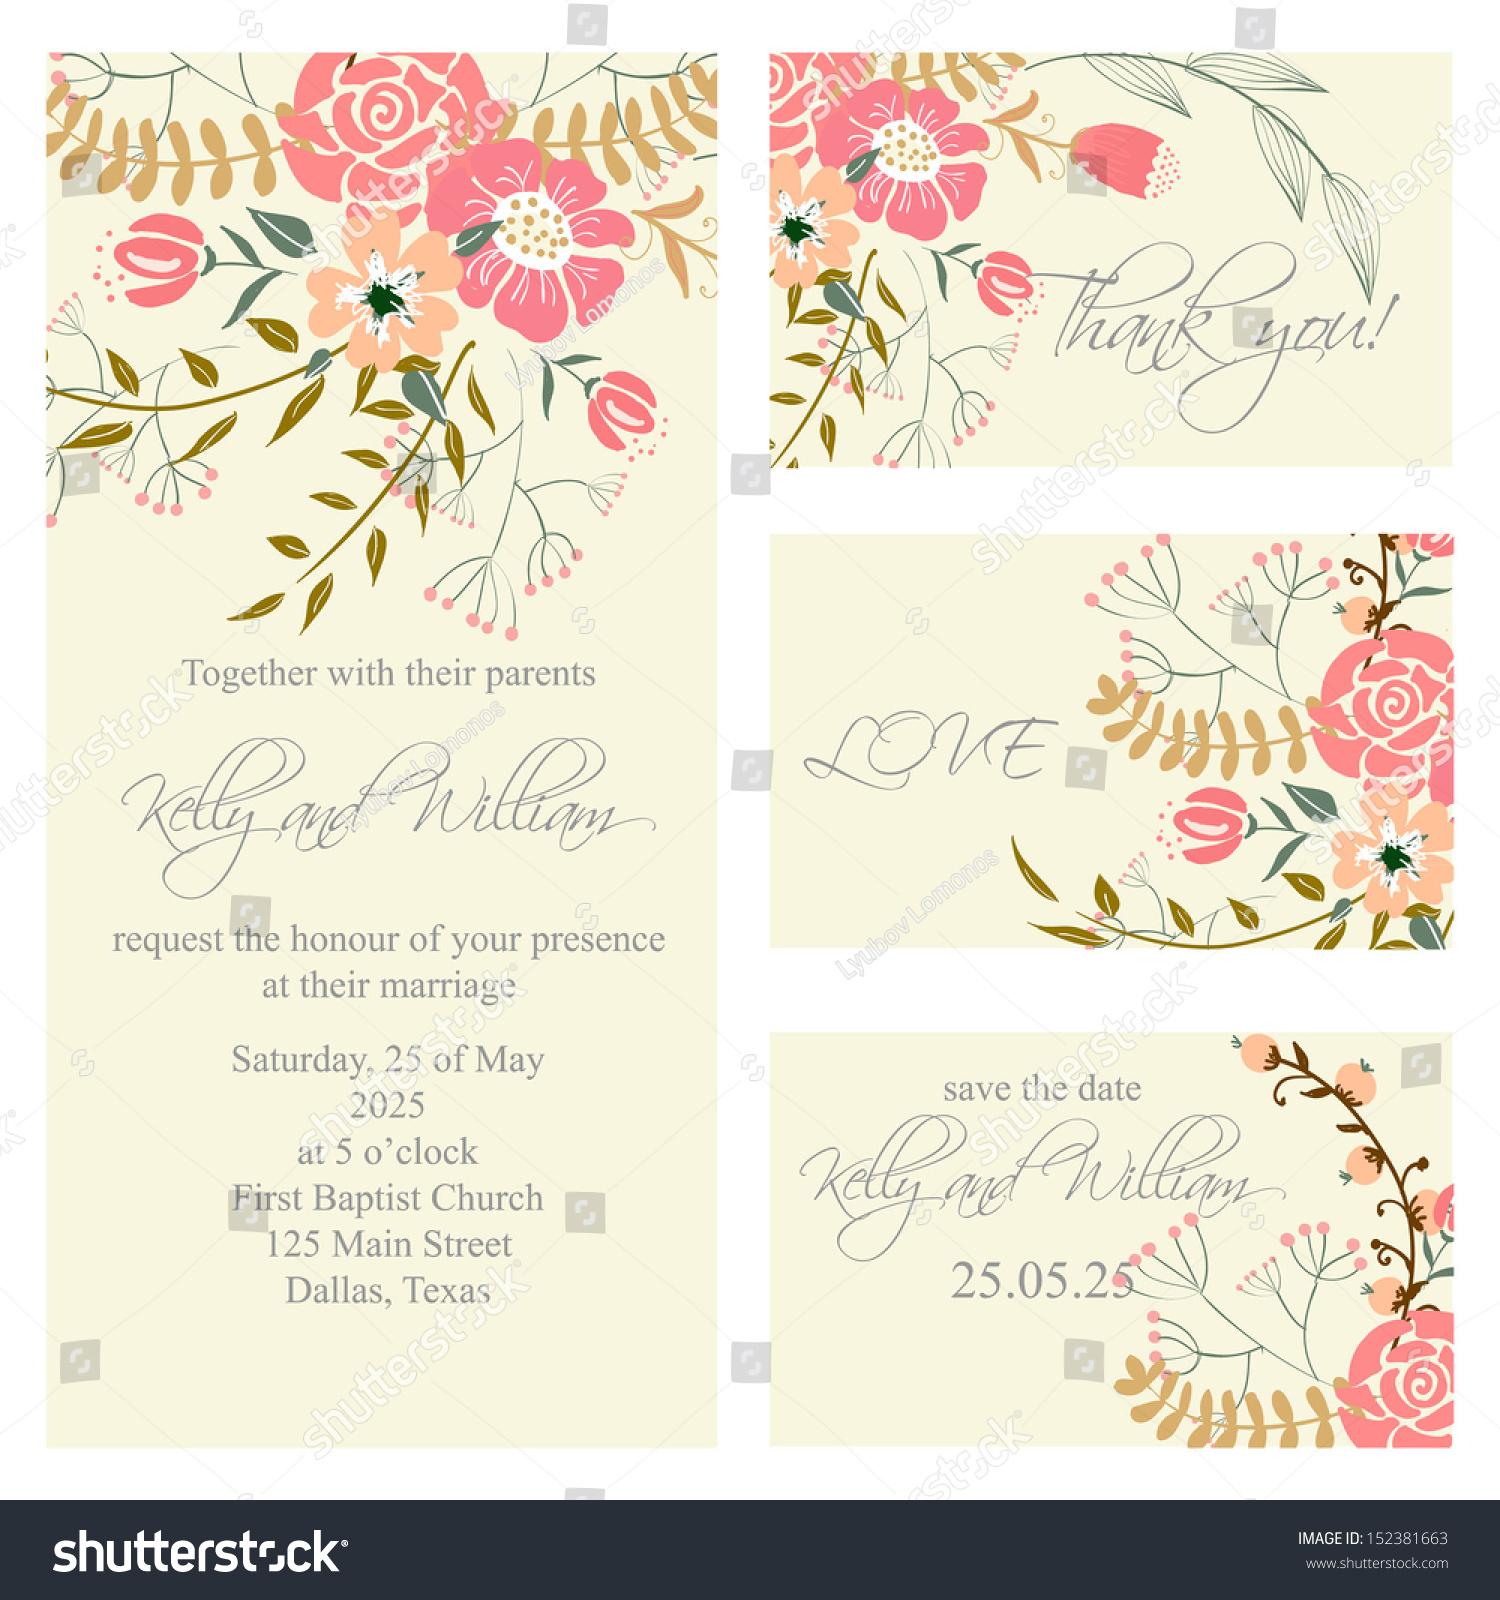 diy thank you cards 2 thank you cards wedding Handmade thank you cards